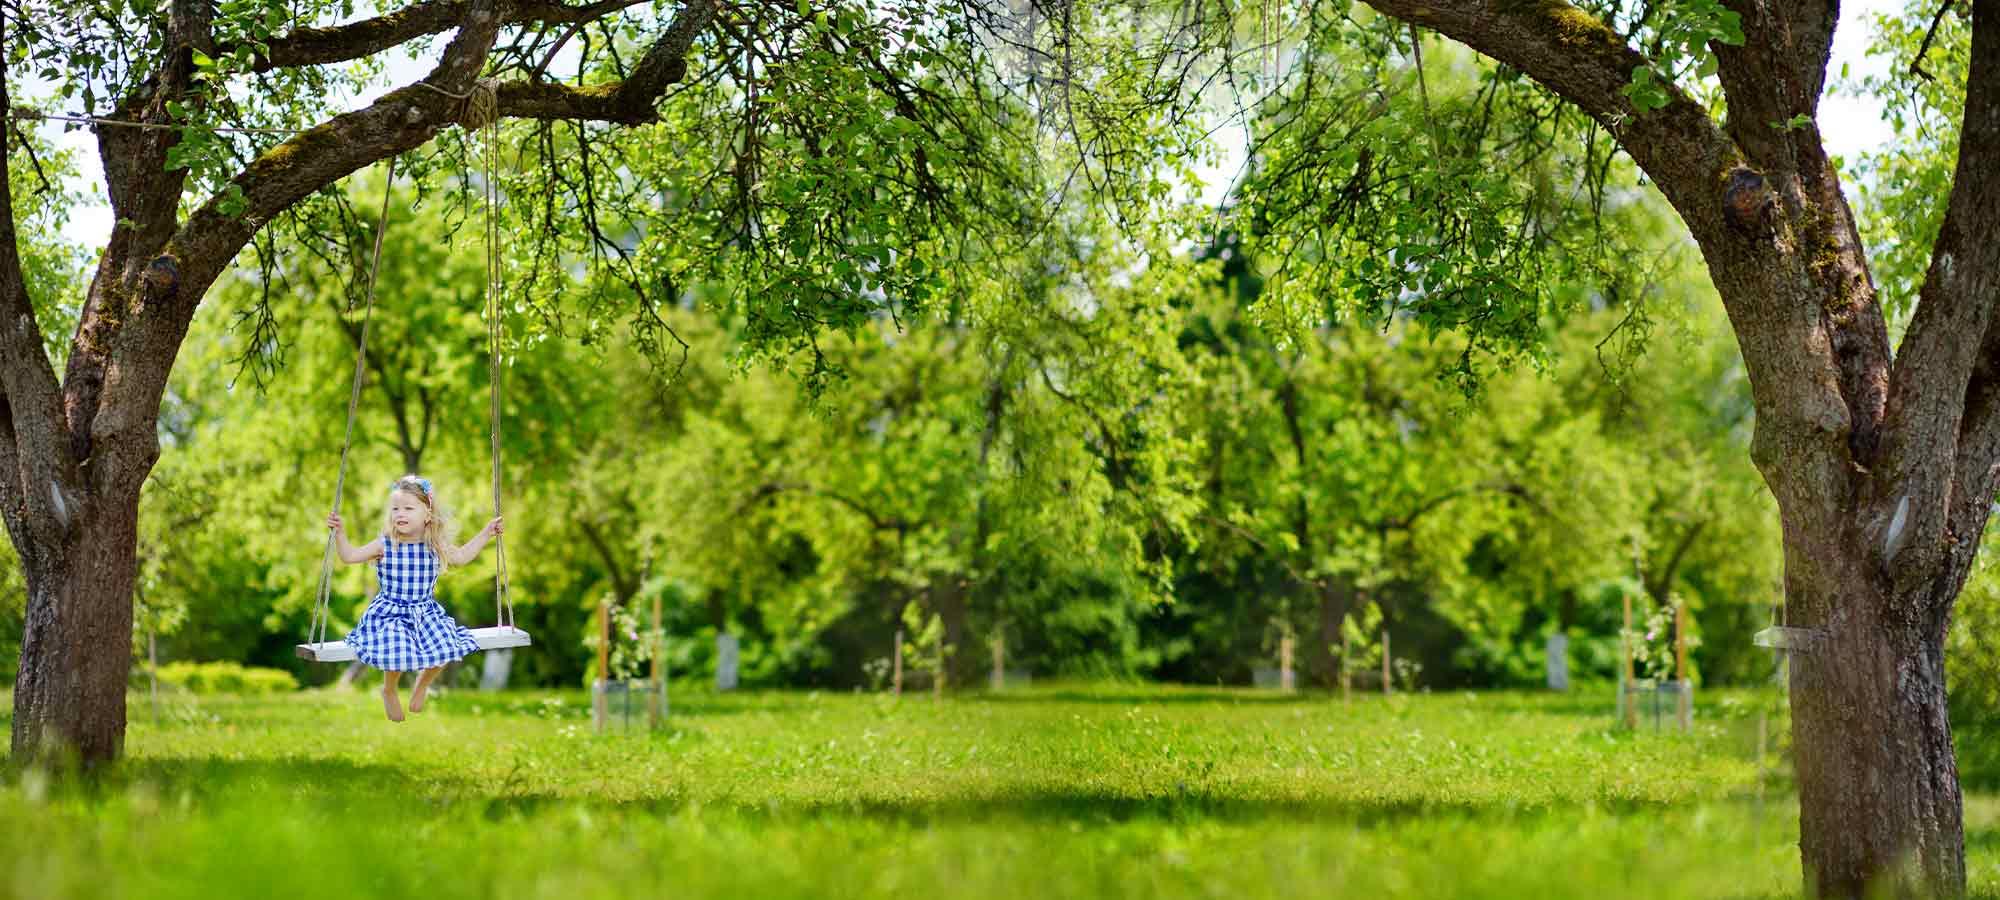 Nos arbres, les racines de notre histoire